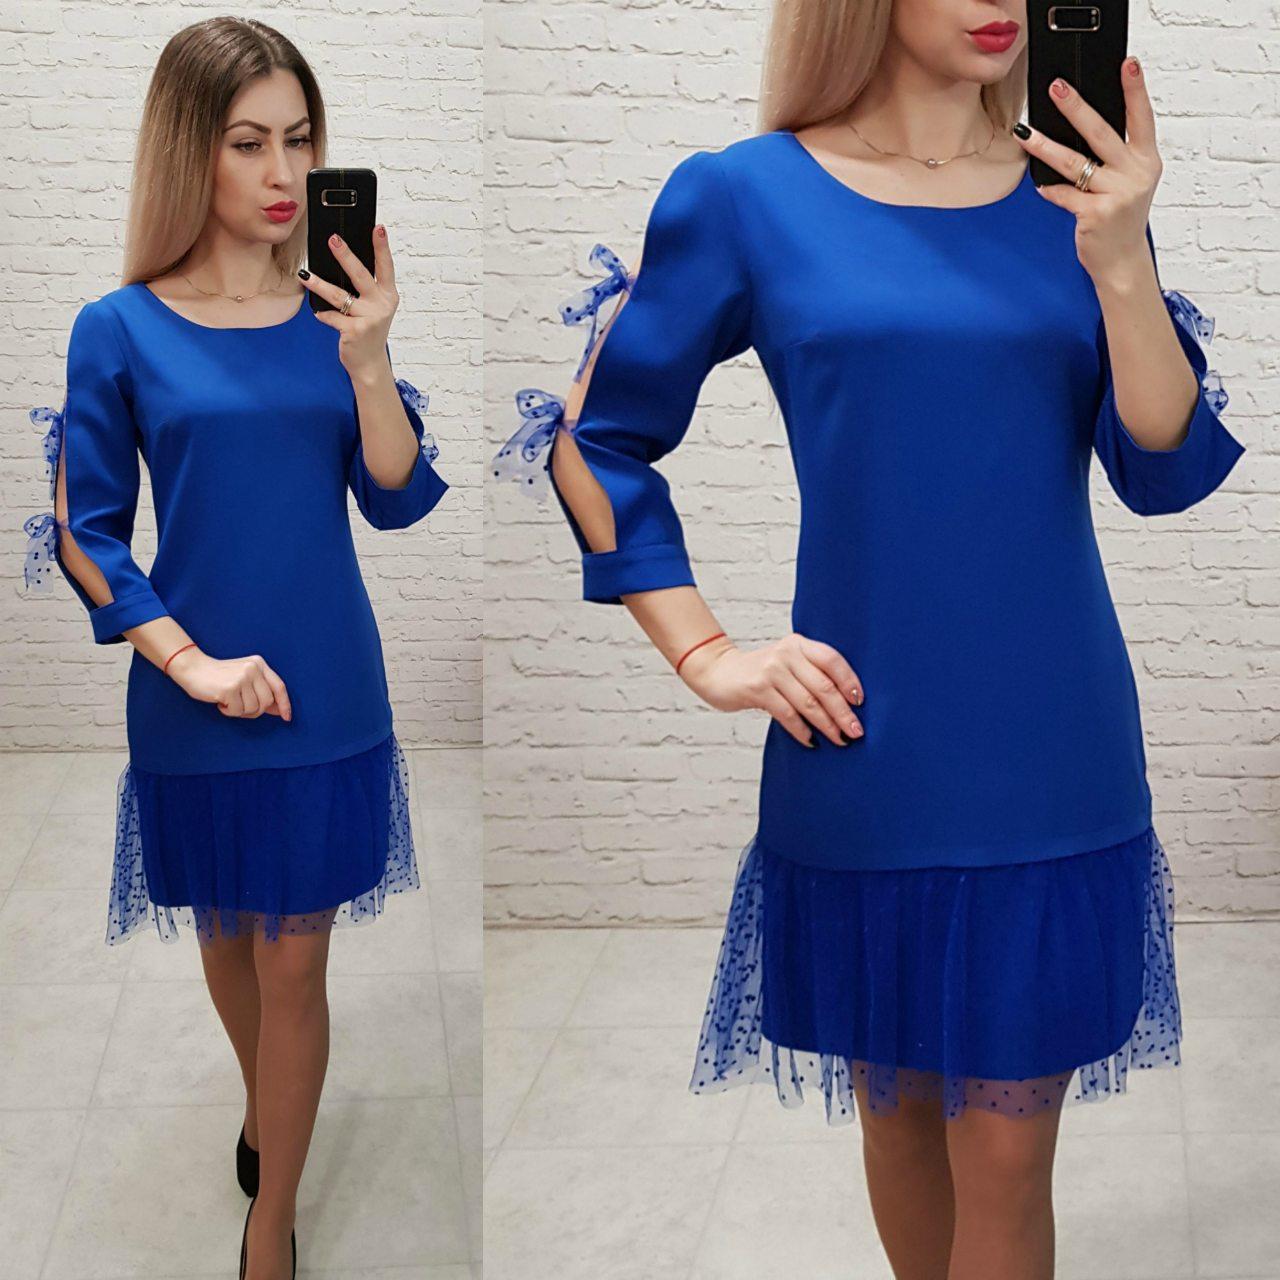 Платье женское, креп+сетка, модель 154, цвет - электрик